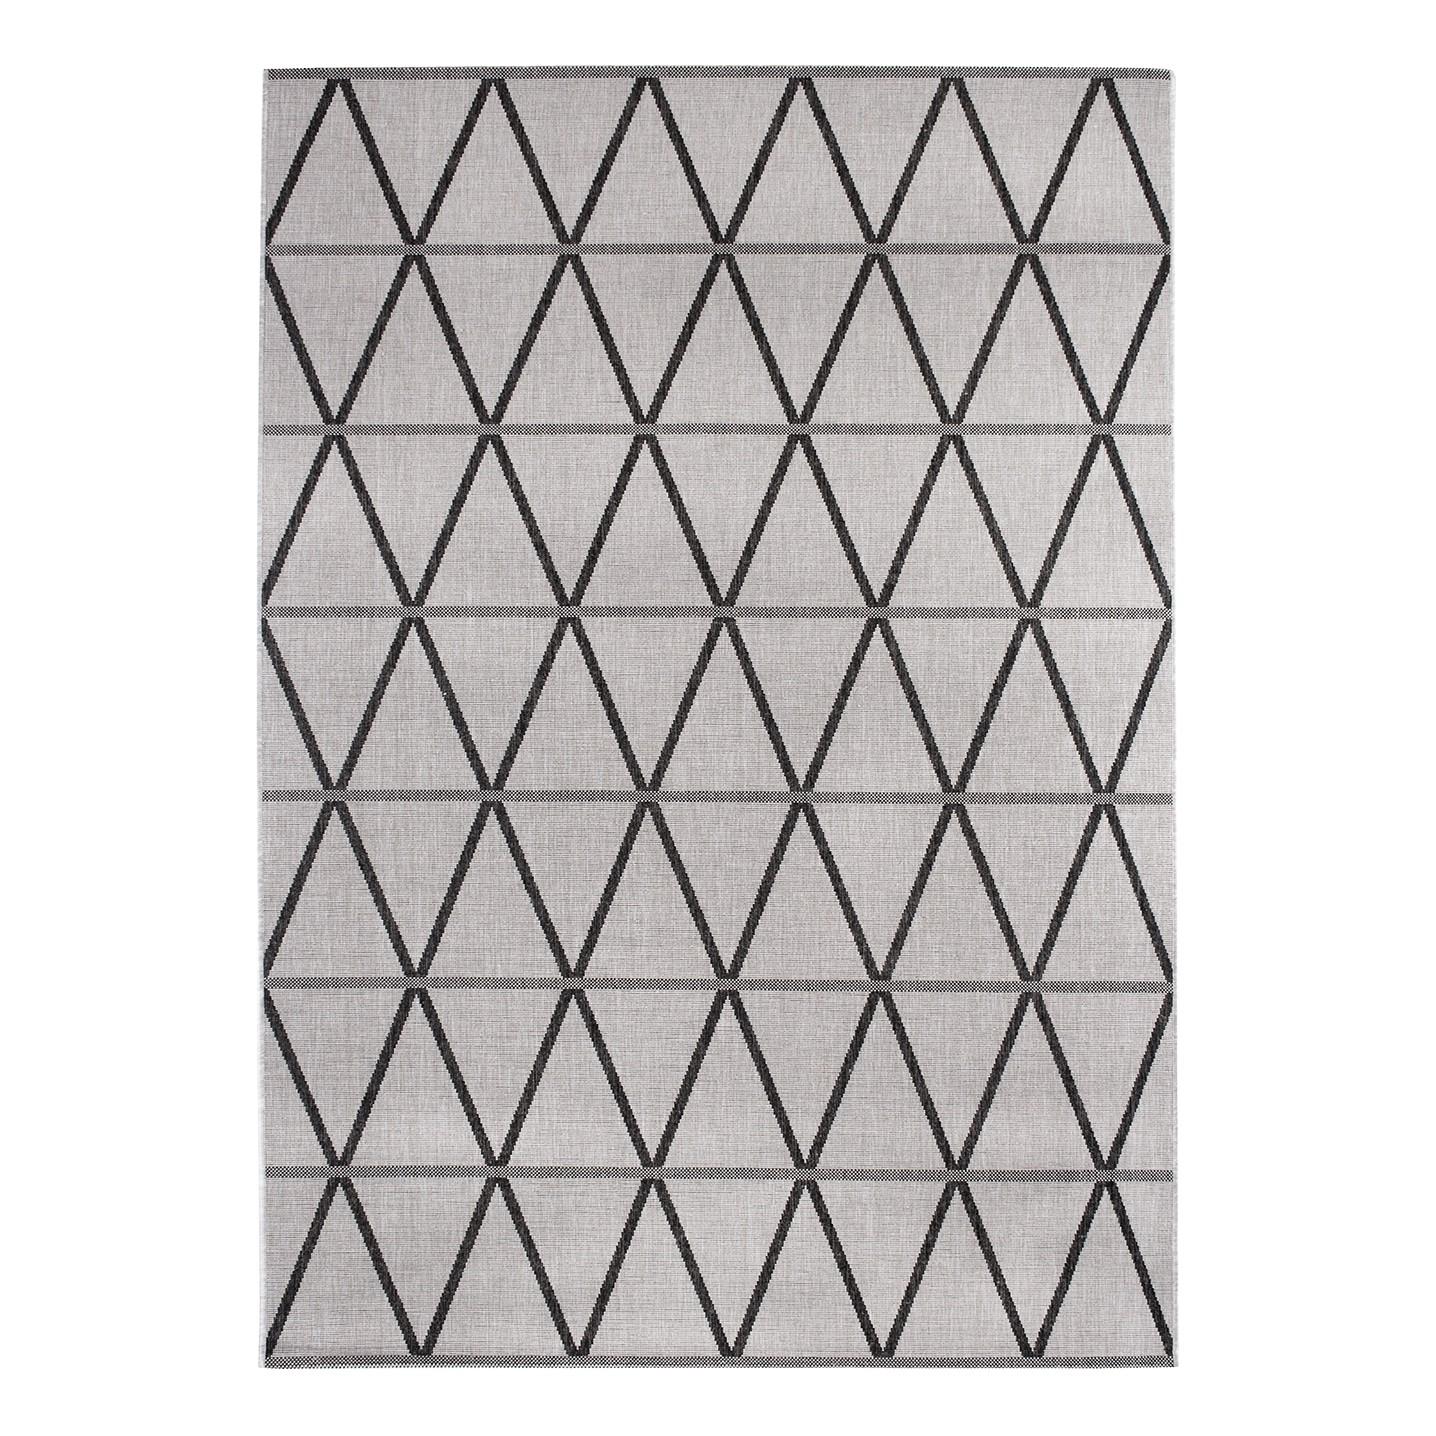 Teppich Kandava - Kunstfaser - Grau / Schwarz - 120 x 170 cm, Morteens